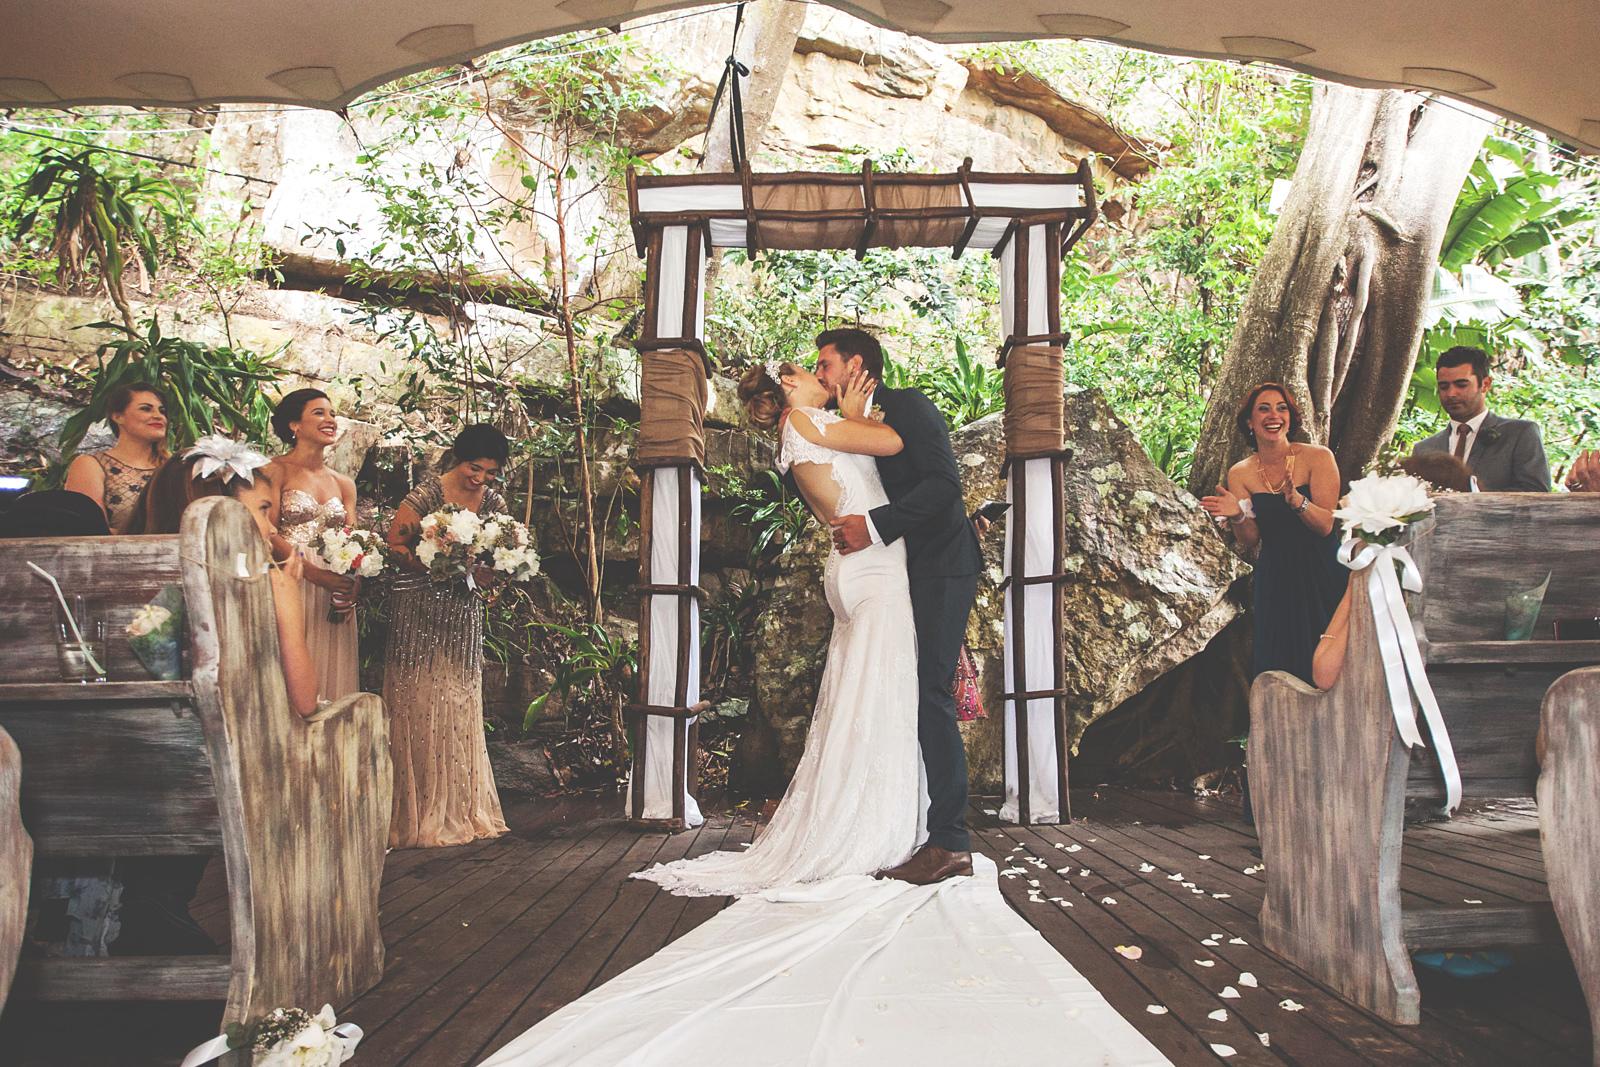 wedding-celebrant-dawn-mcallum-32.JPG